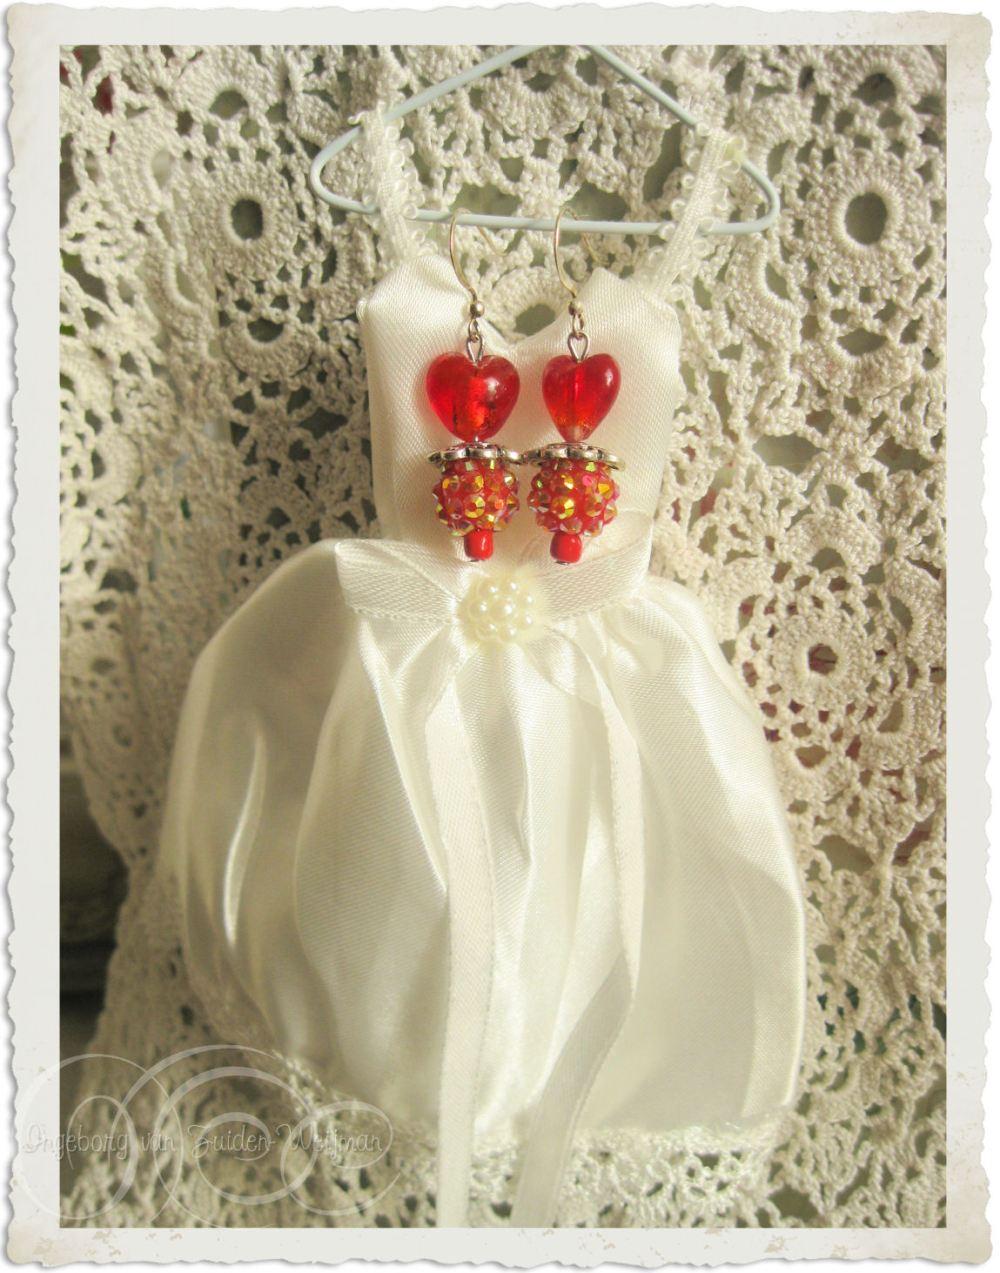 Valentine heart earrings by Ingeborg van Zuiden